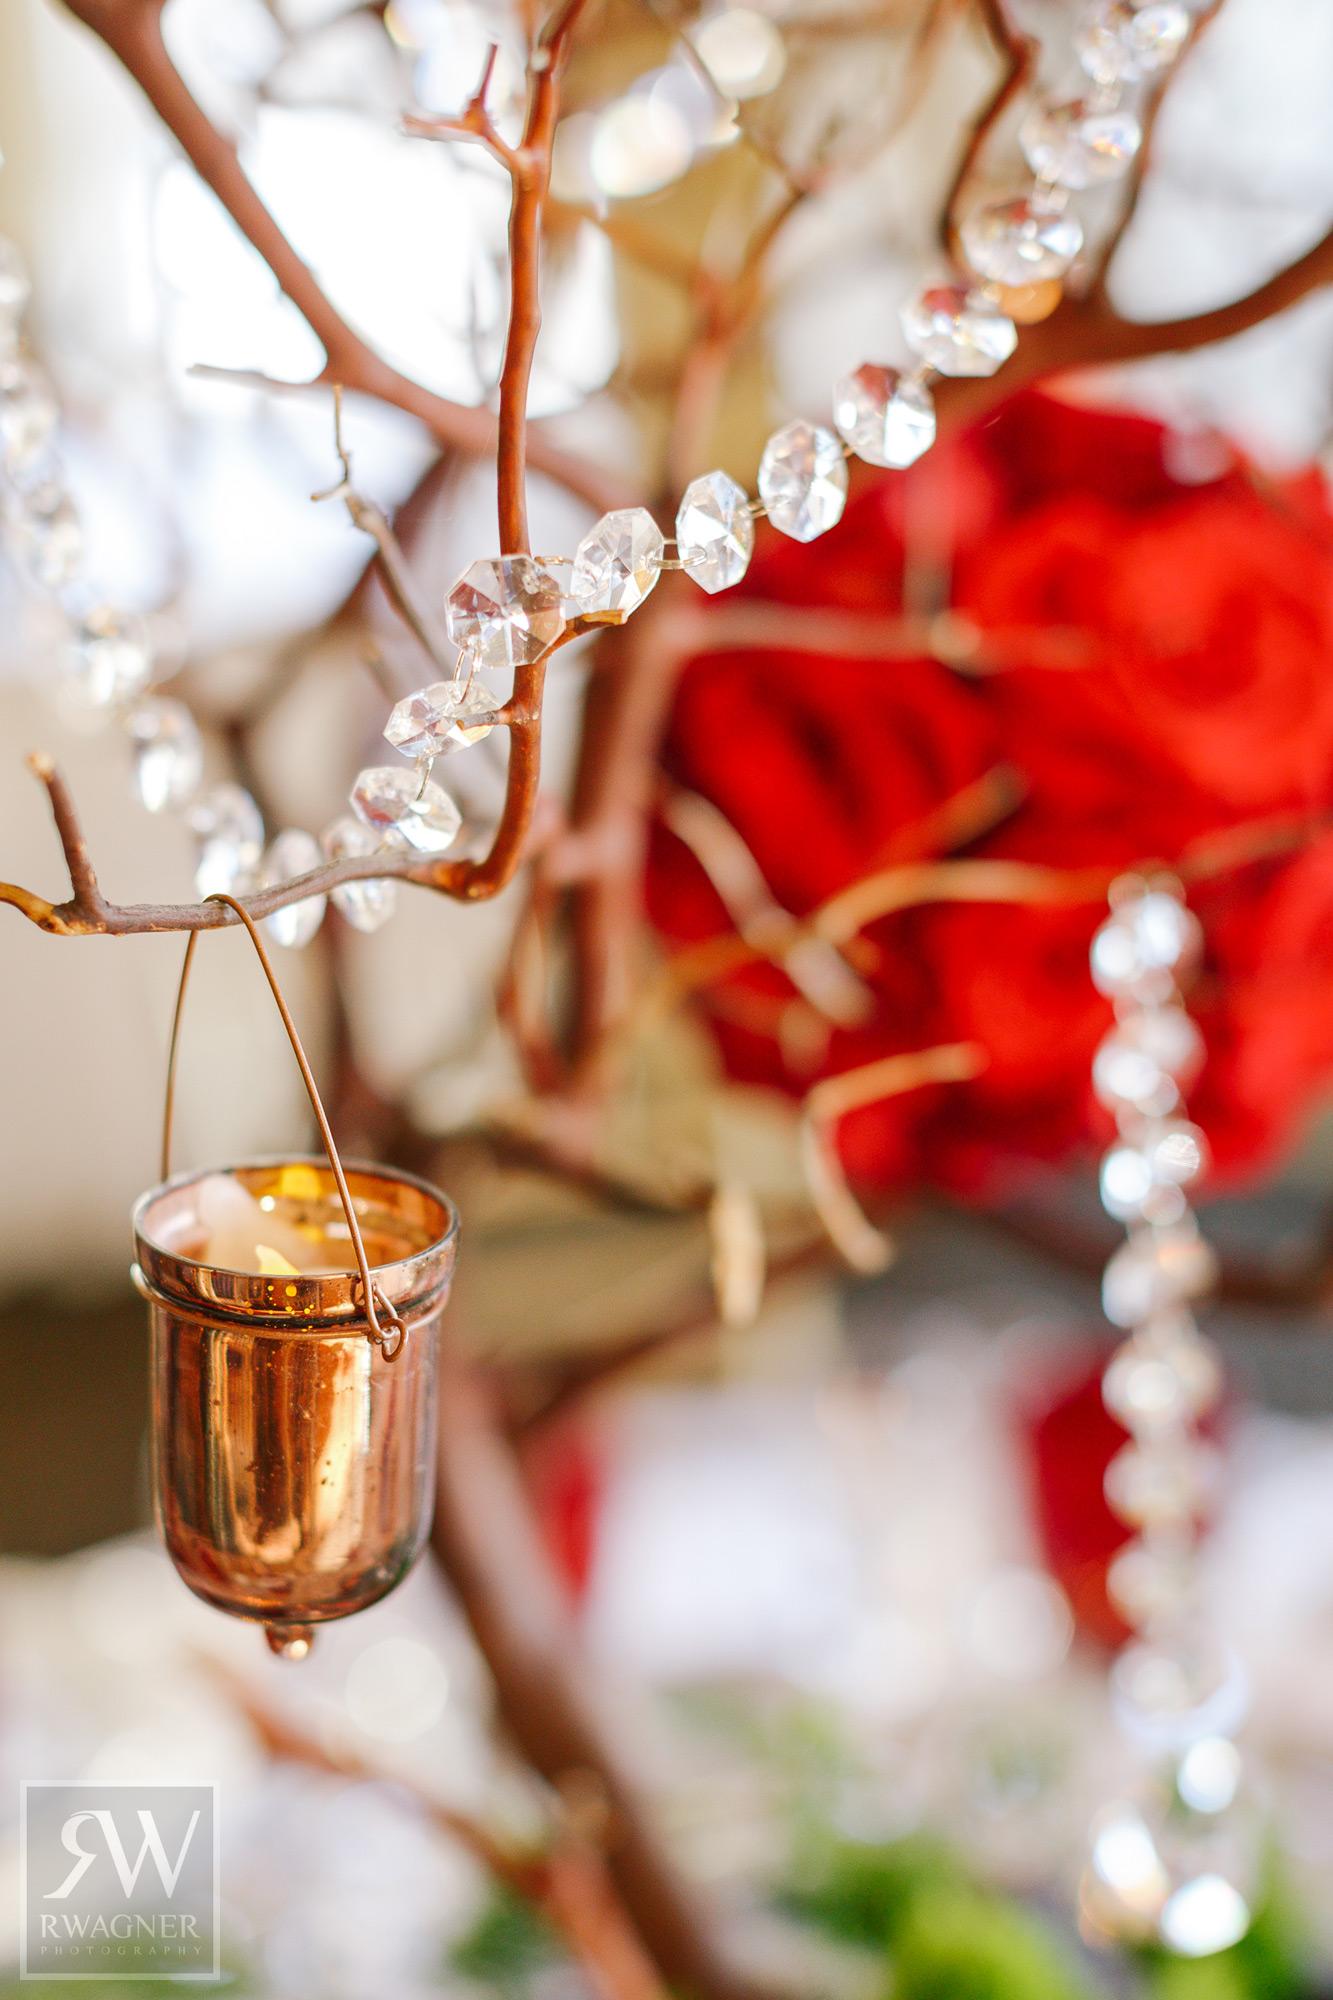 ceci_new_york_luxury_wedding_invitations_couture_red_black_white_real_wedding_dramatic_inn_at_longshore_v286_22.jpg